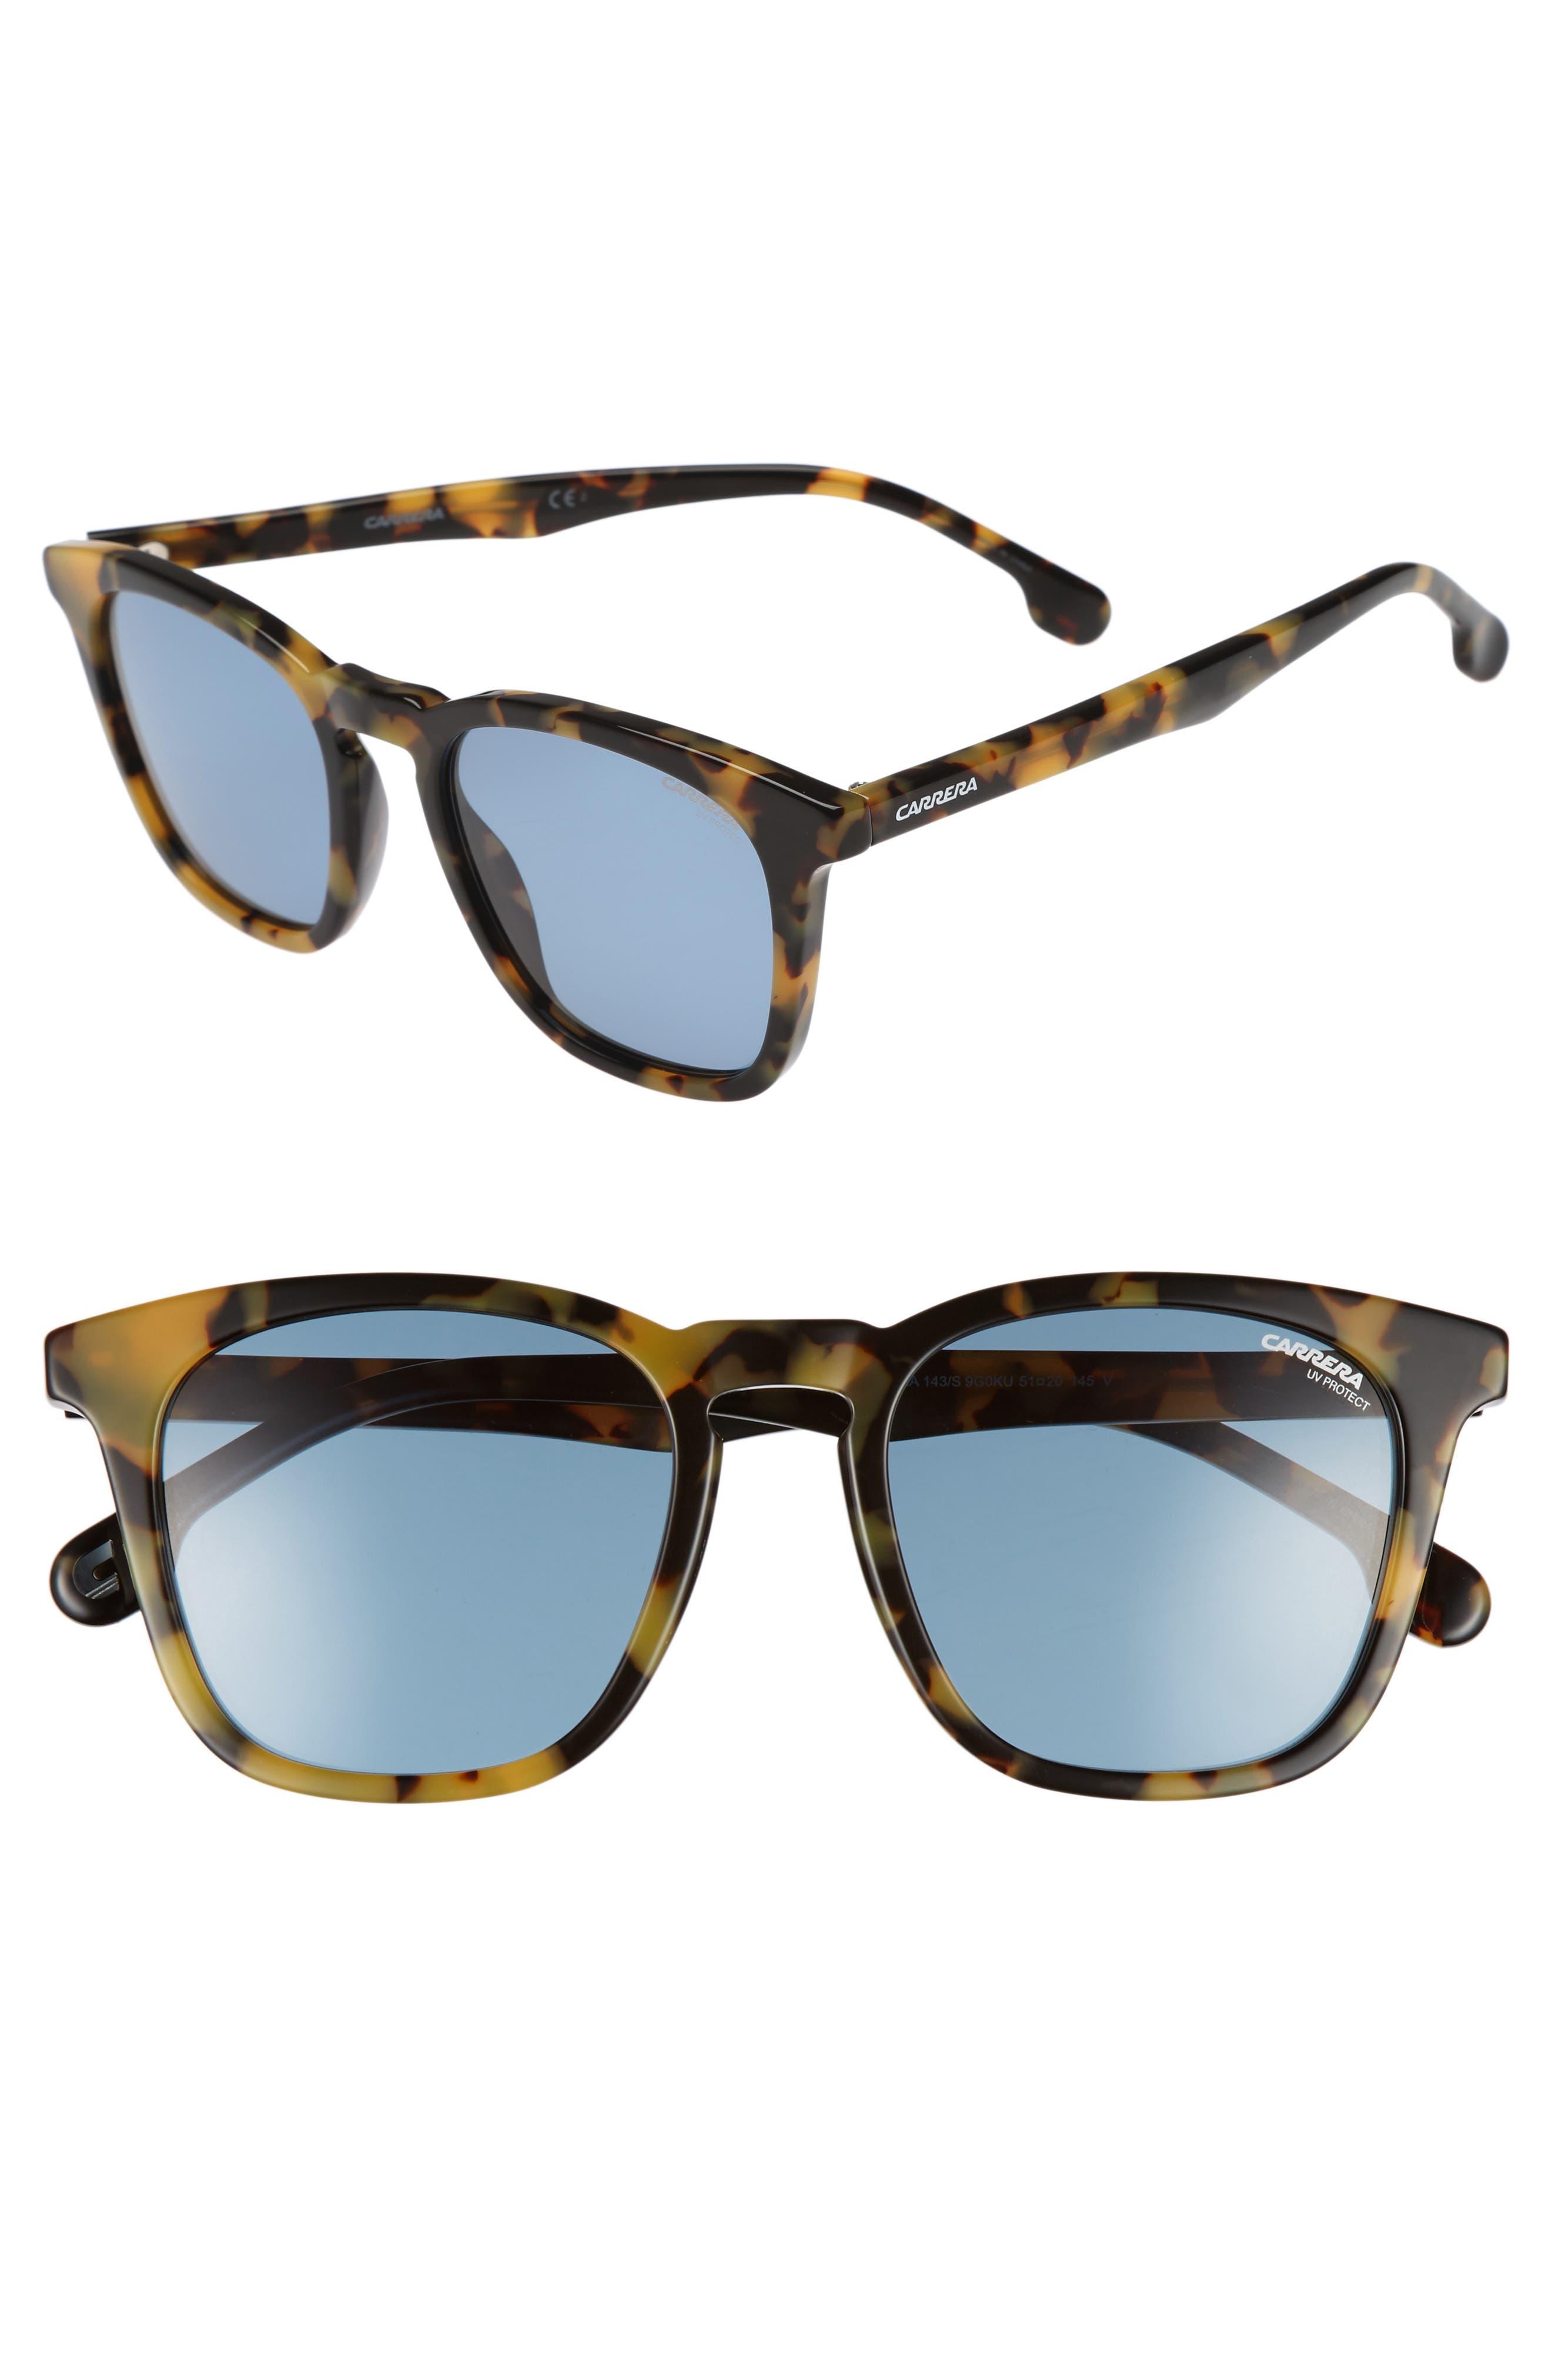 Carrera 143S 51mm Sunglasses,                             Main thumbnail 1, color,                             Havana Palladium/ Blue Avio